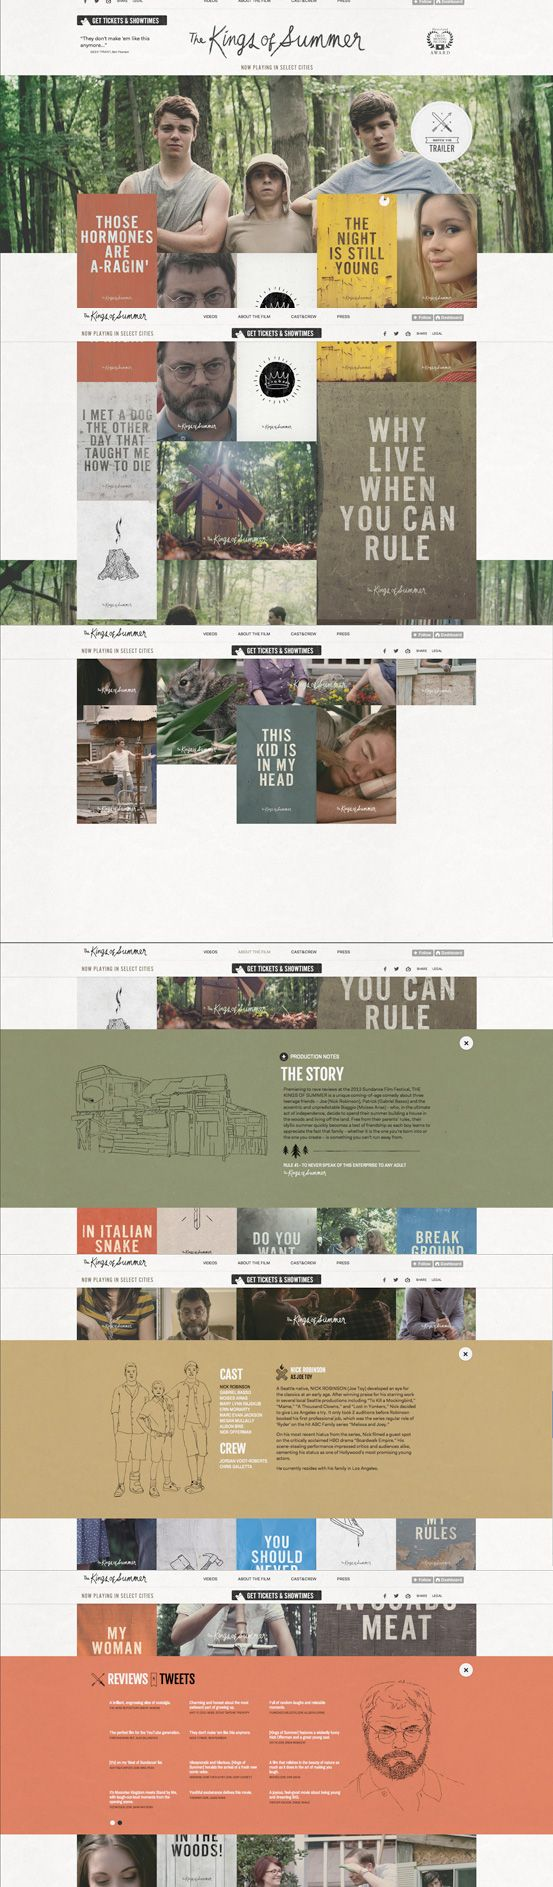 The Kings of Summer Tumblr Site #webdesign #inspiration #UI #Social Media